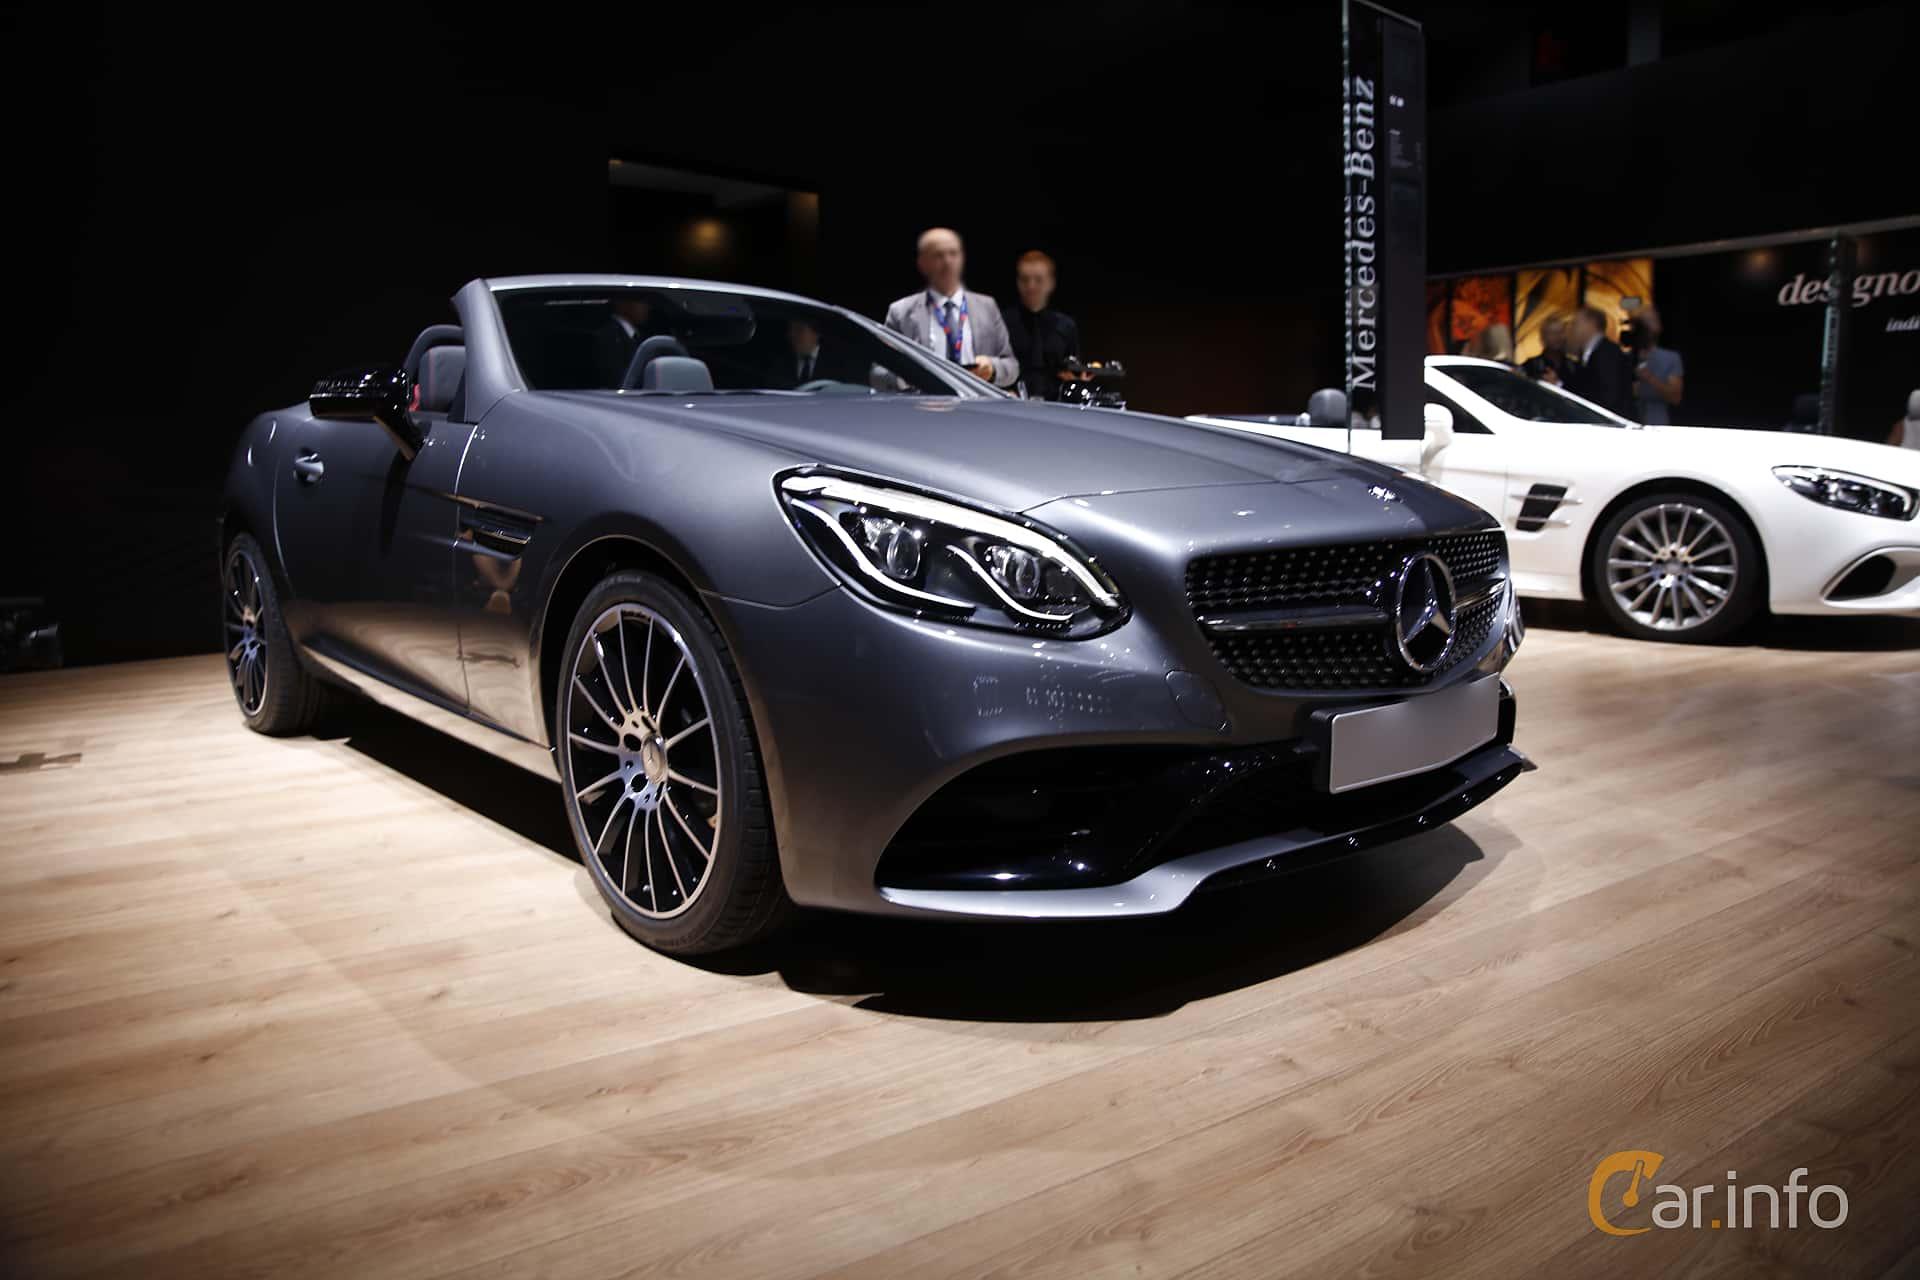 Mercedes-Benz SLC 180 9G-Tronic, 156hp, 2017